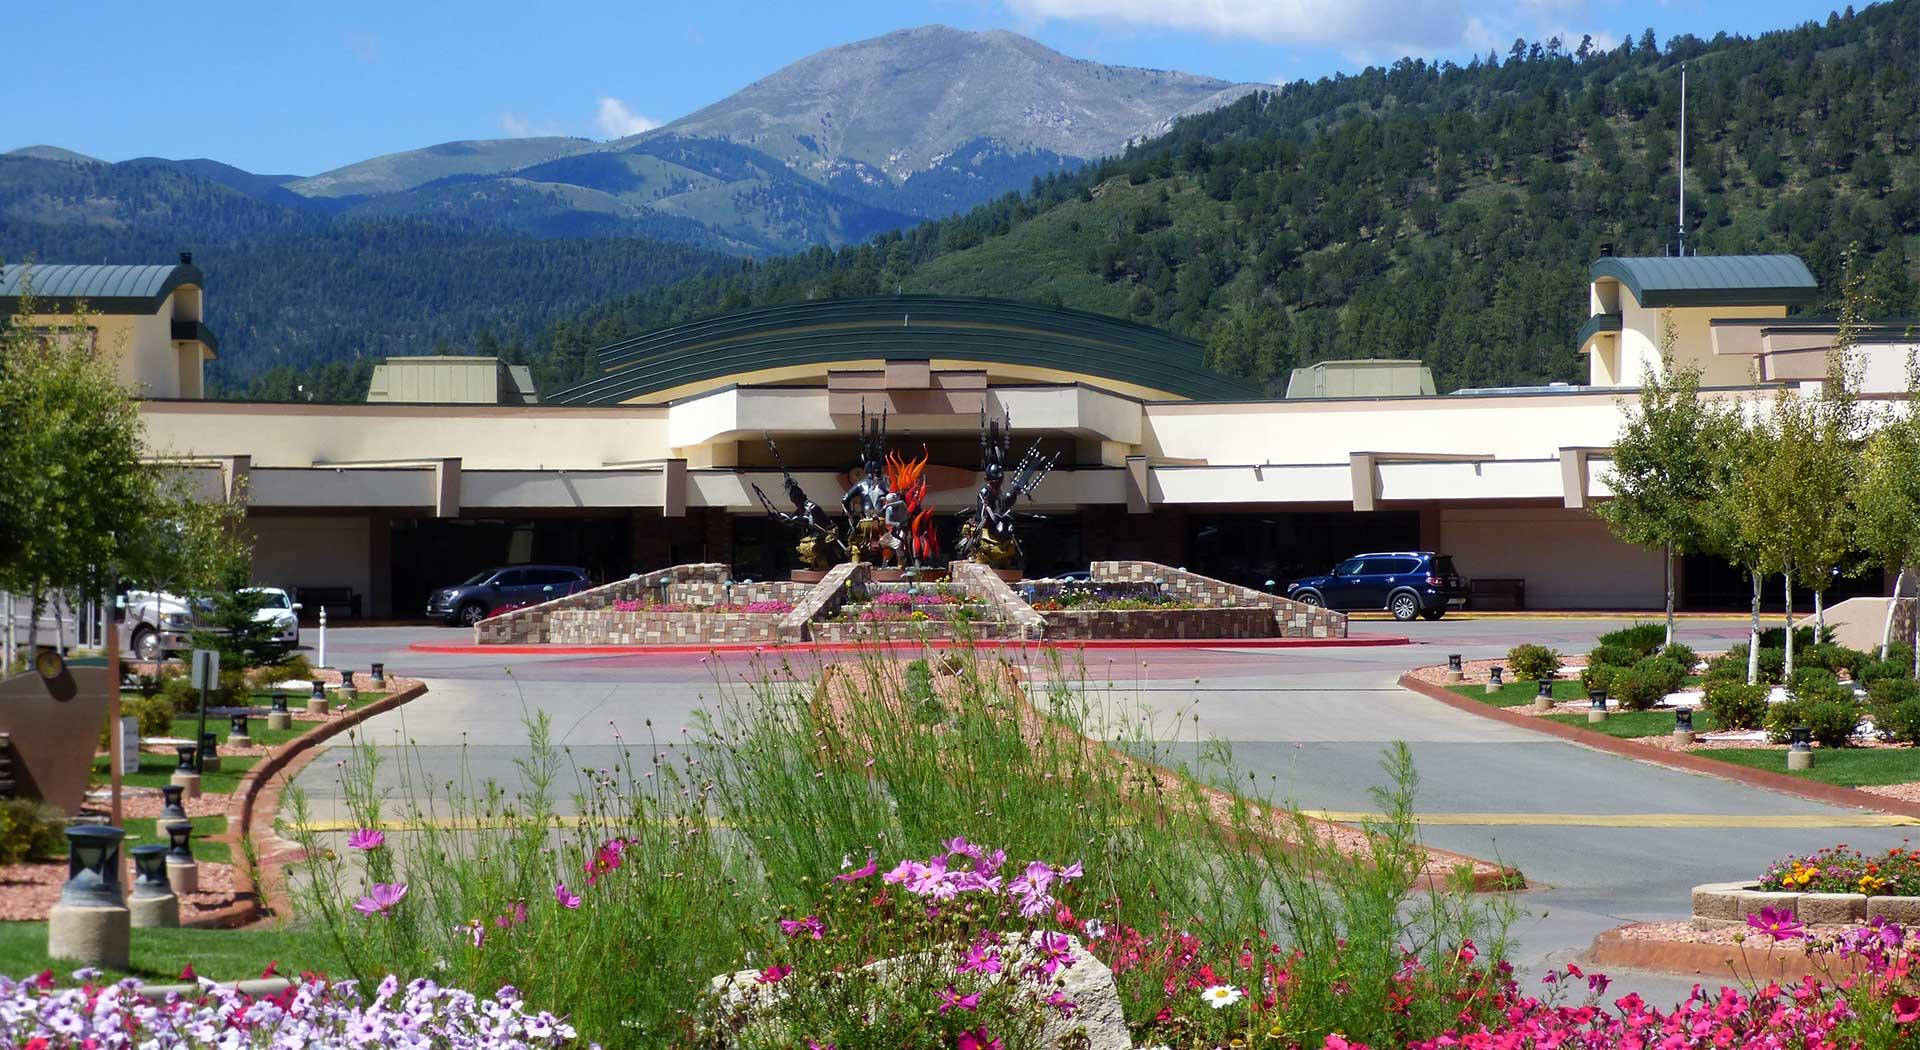 Inn of the Mountain Gods in Mescalero